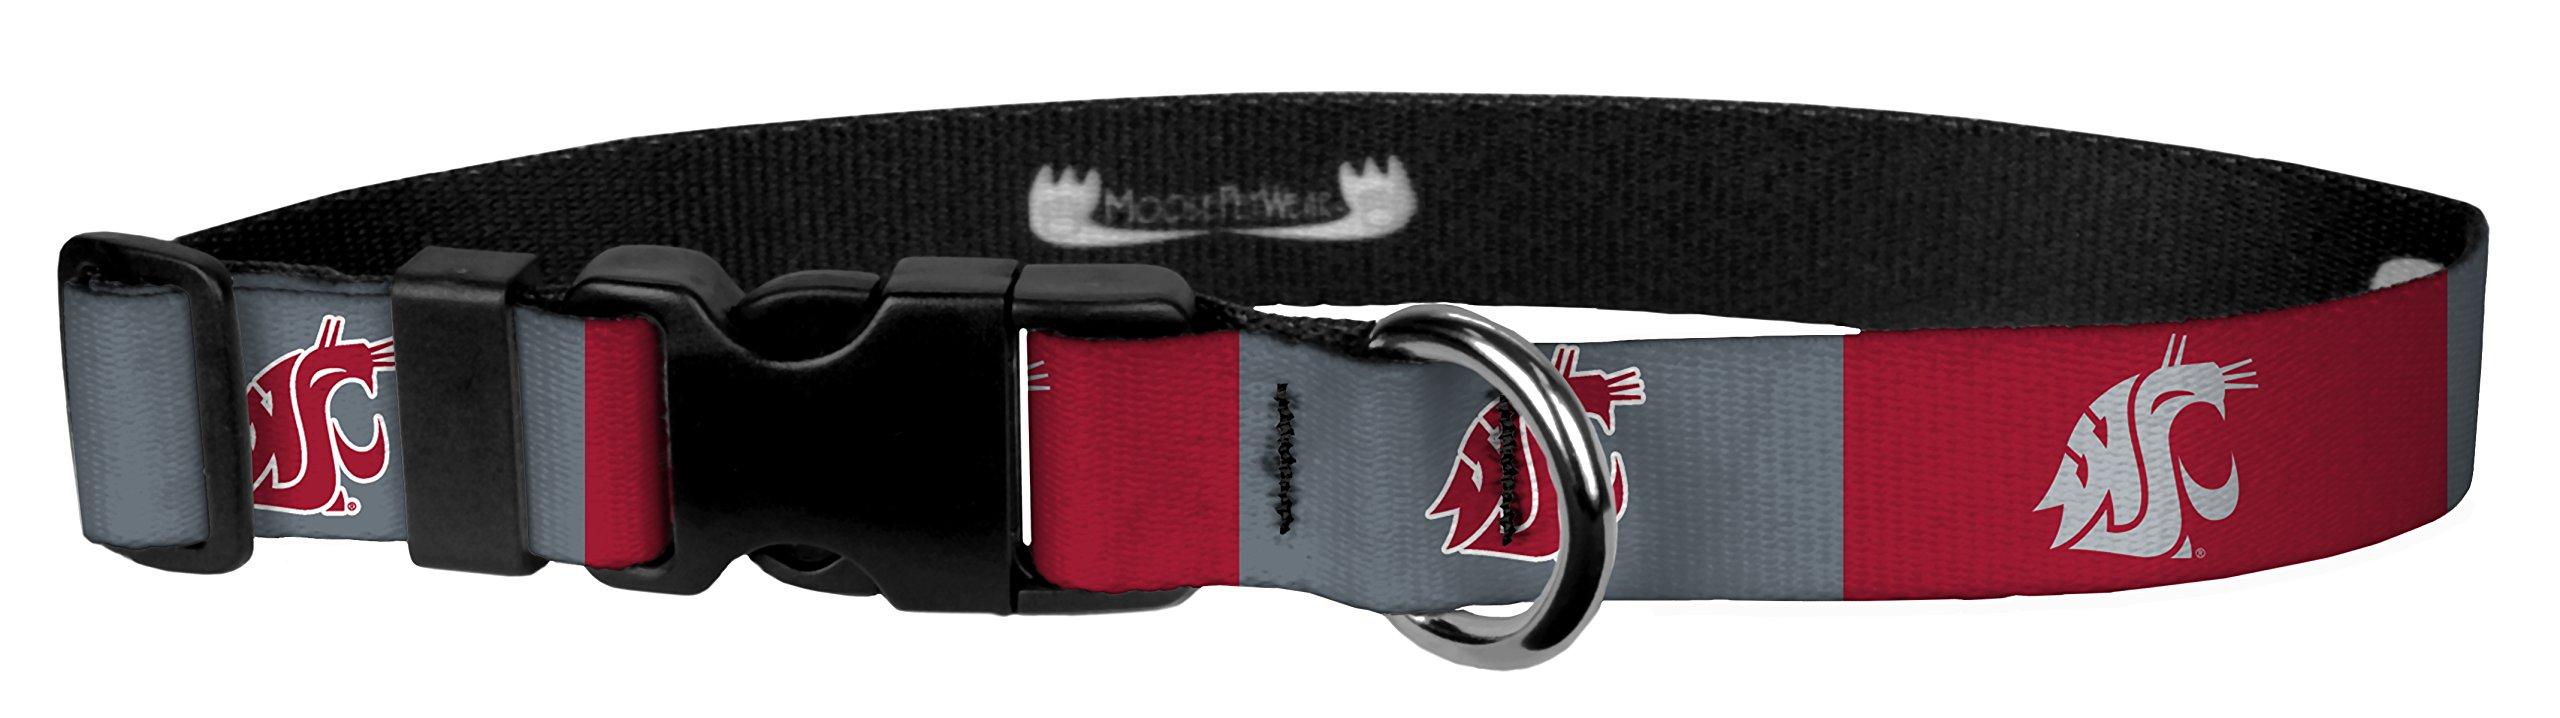 Moose Pet Wear Dog Collar - Washington State University Cougars Adjustable Pet Collars, Made in The USA - 1 Inch Wide, Large, Red/Gray Box Logo